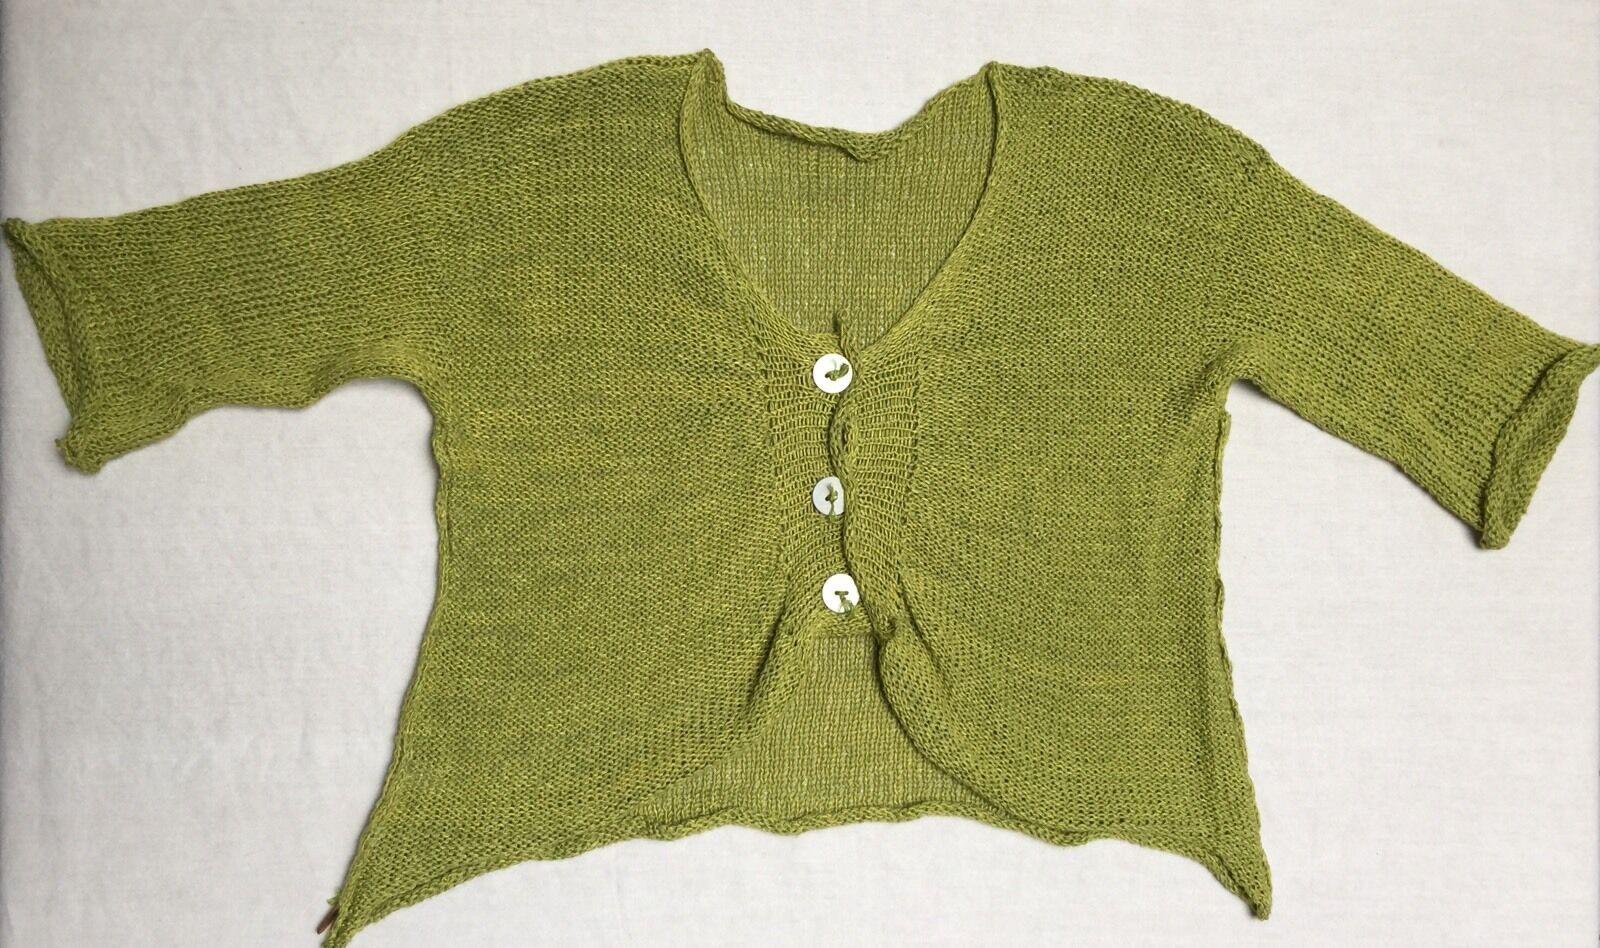 SKIF Cardigan Sweater in Chartreuse Chartreuse Chartreuse Greens Asymmetrical Hem Lagenlook OS 79edd5